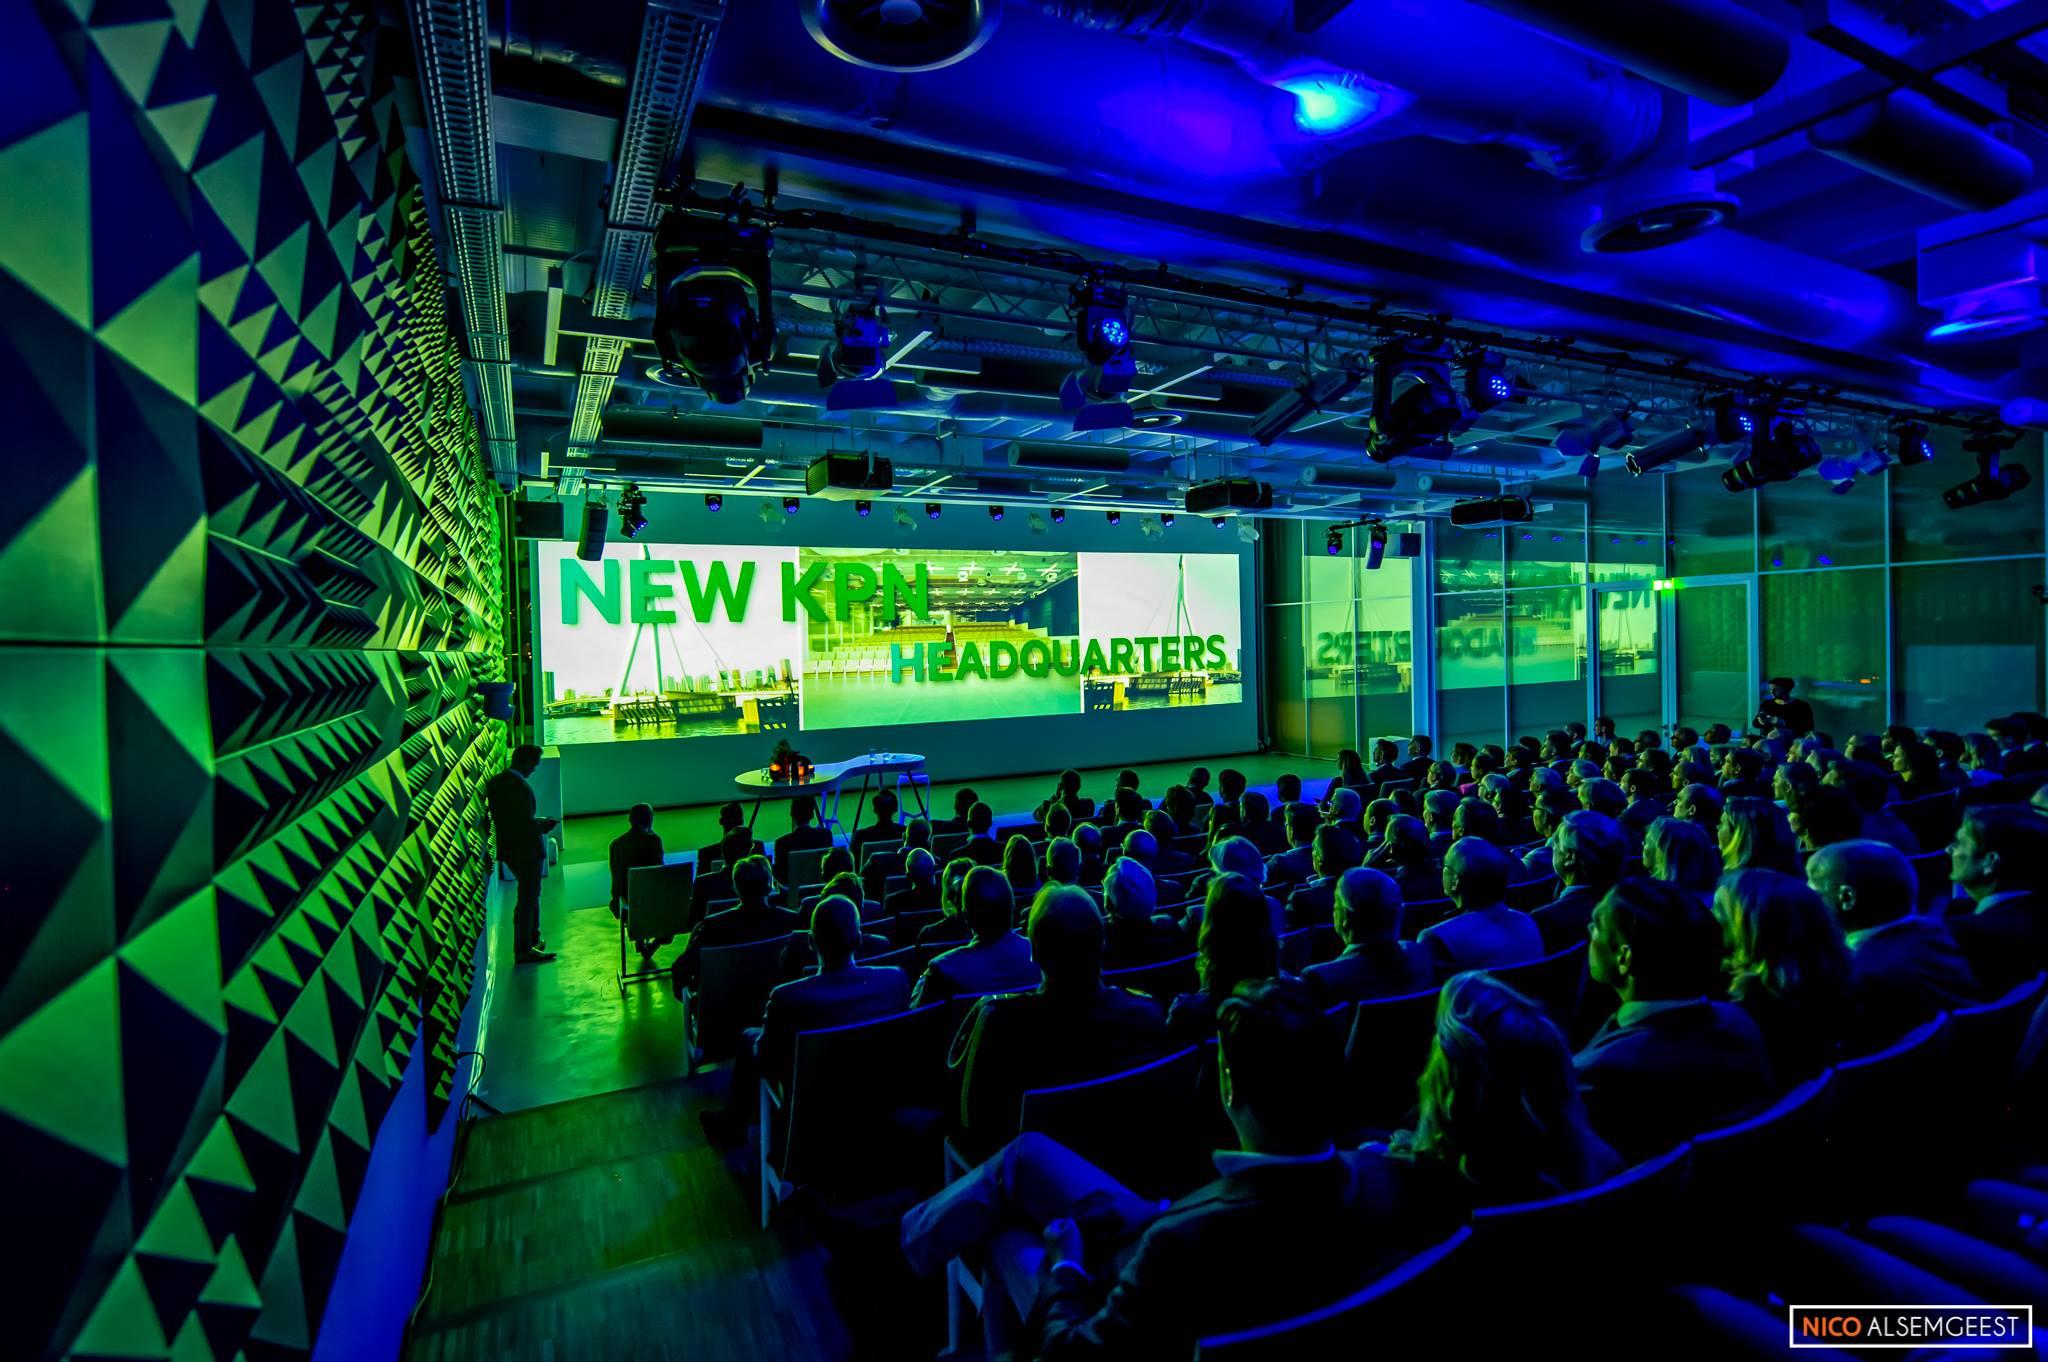 kpn openingshow rotterdam headquarters